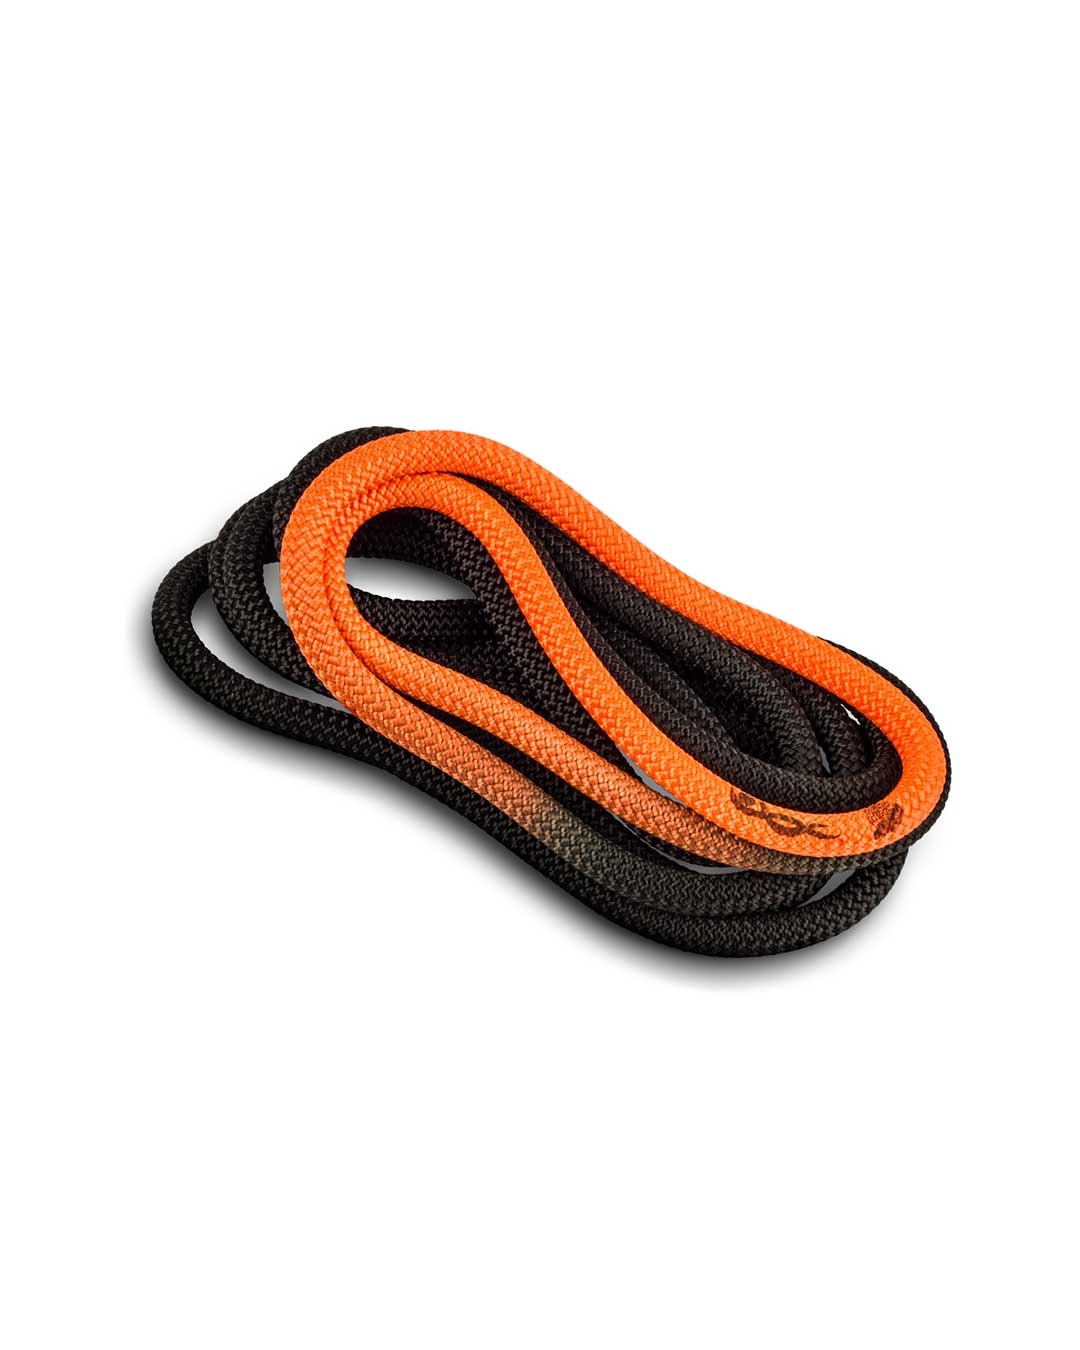 Cuerda de gimnasia rítmica VENTURELLI (Certificada FIG) naranja negro - 3 m